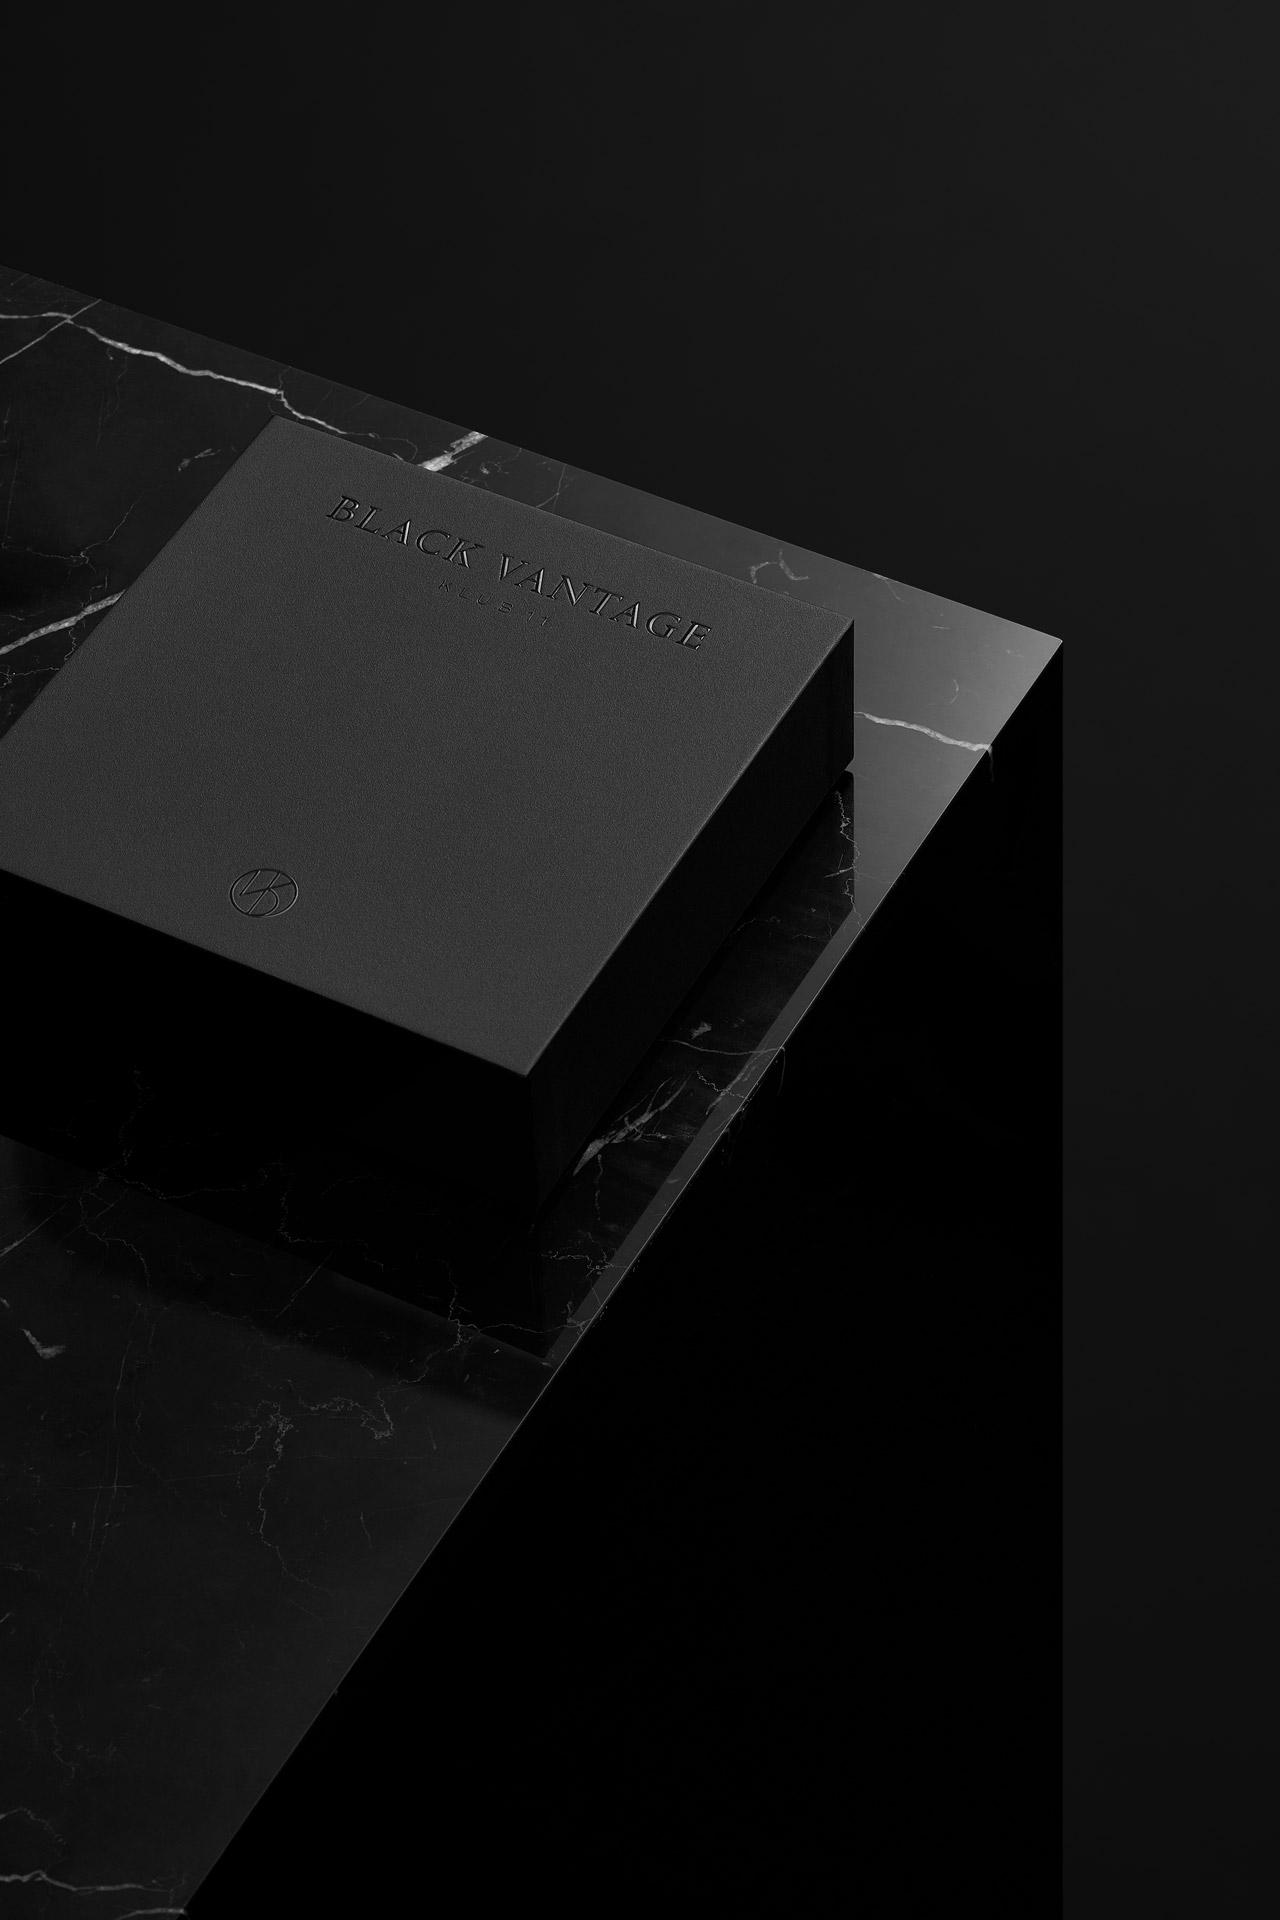 black-vantage_02